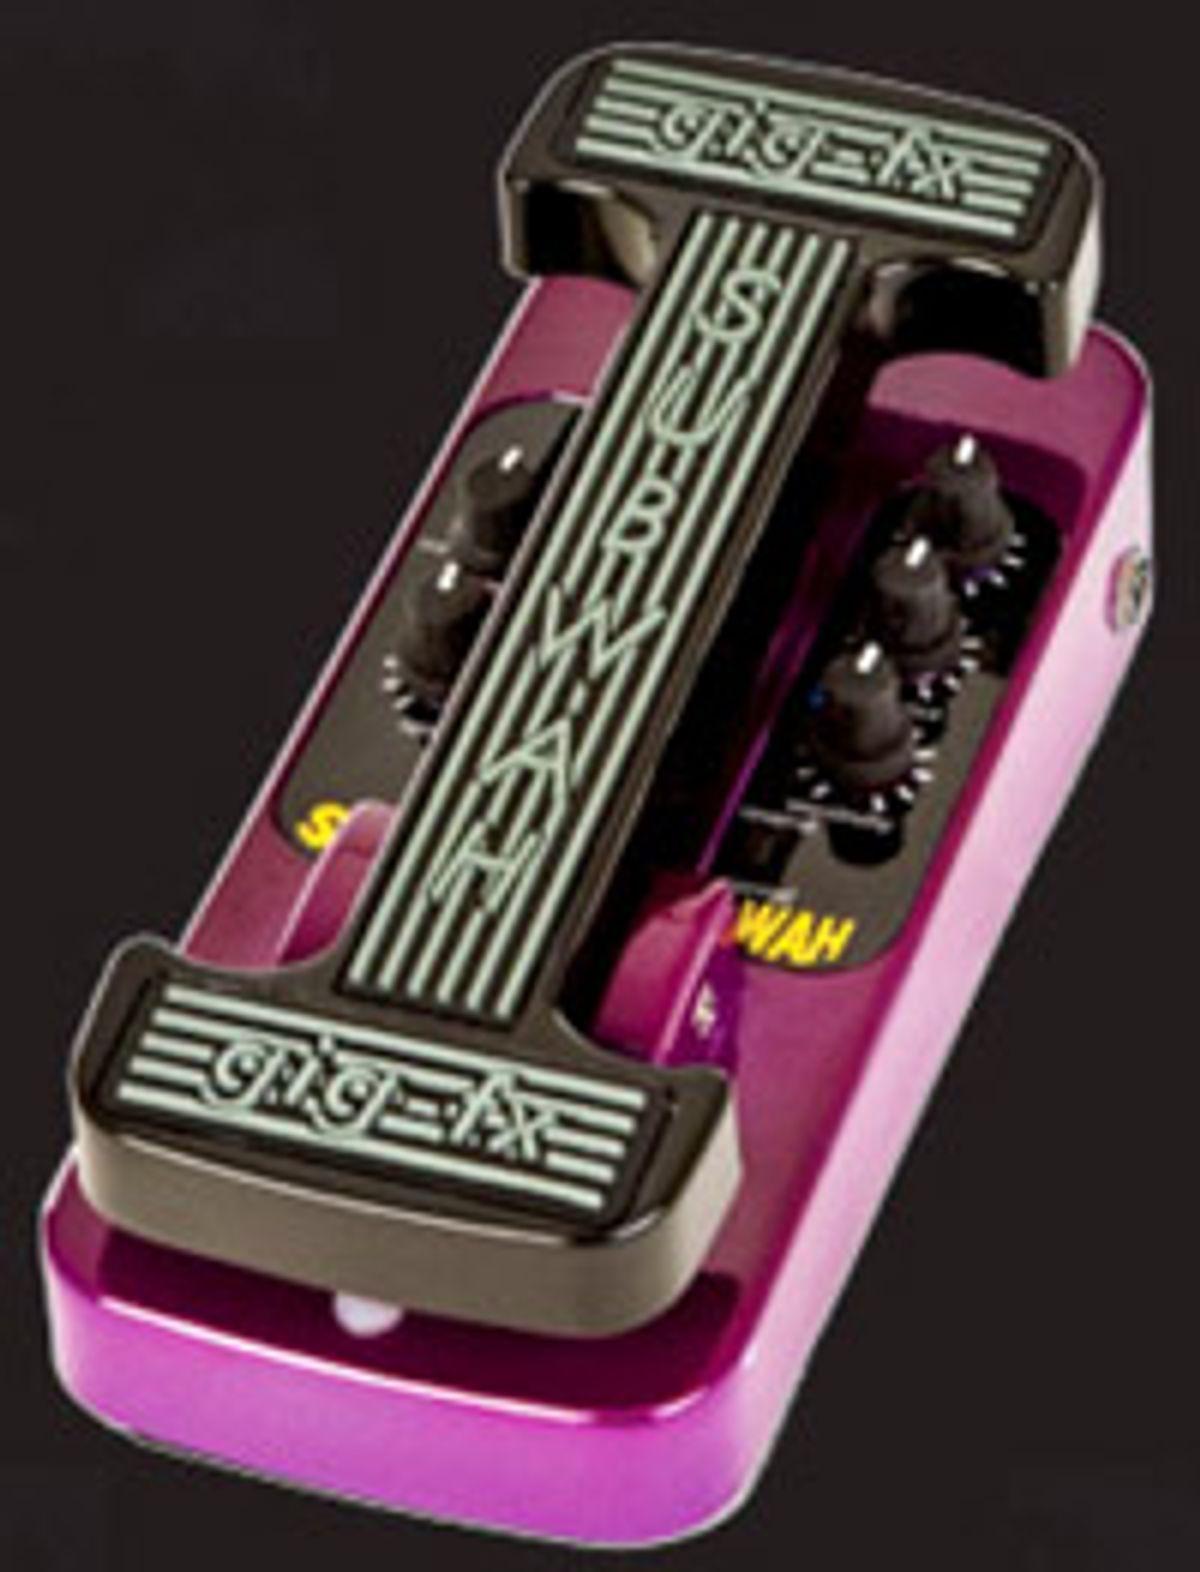 Gig-Fx Announces SubWah for Bass